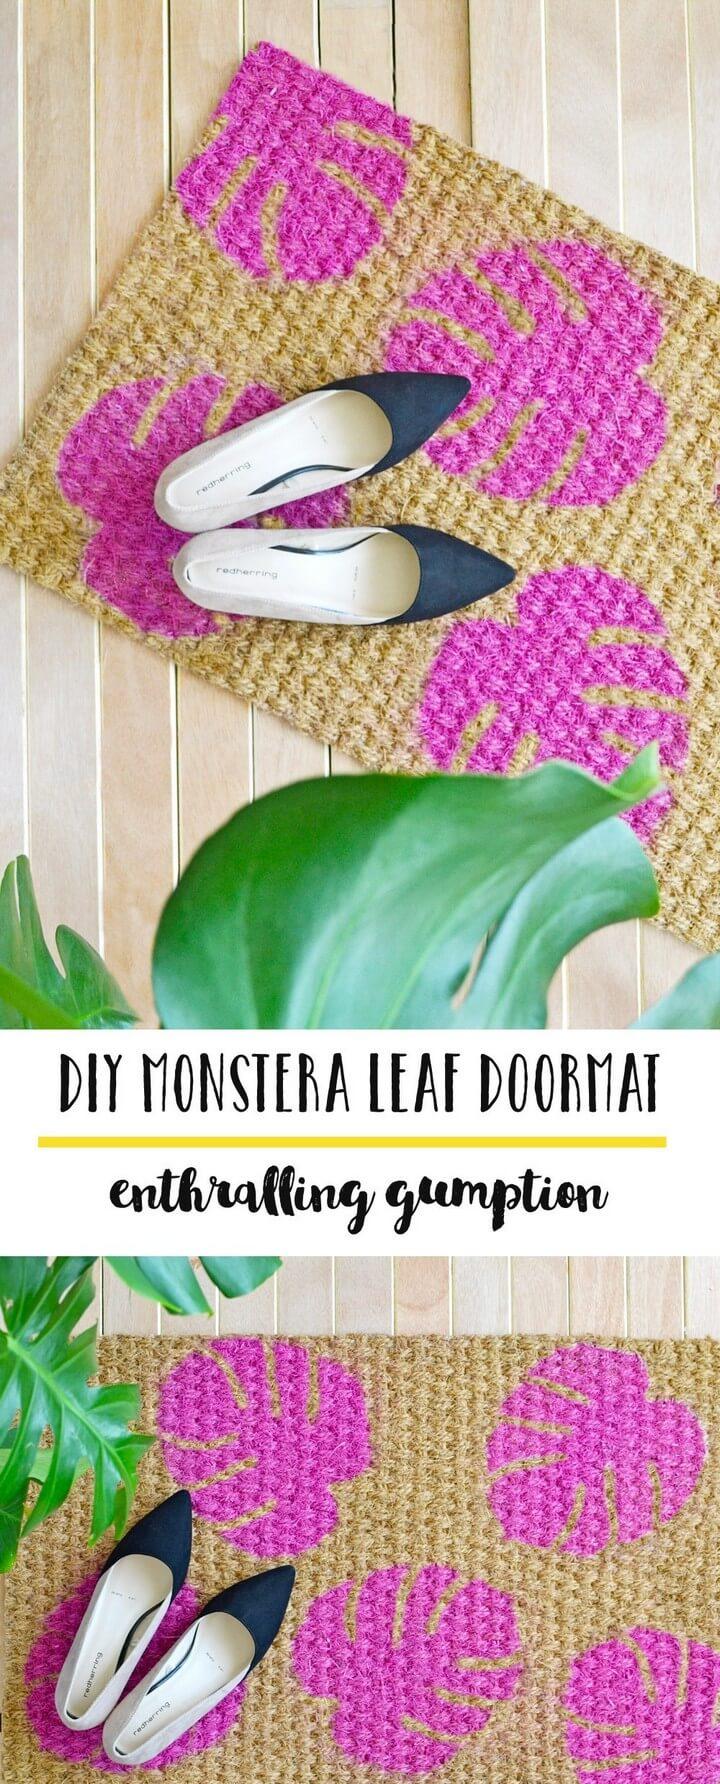 DIY Monstera Leaf Dorrmat Tutorial